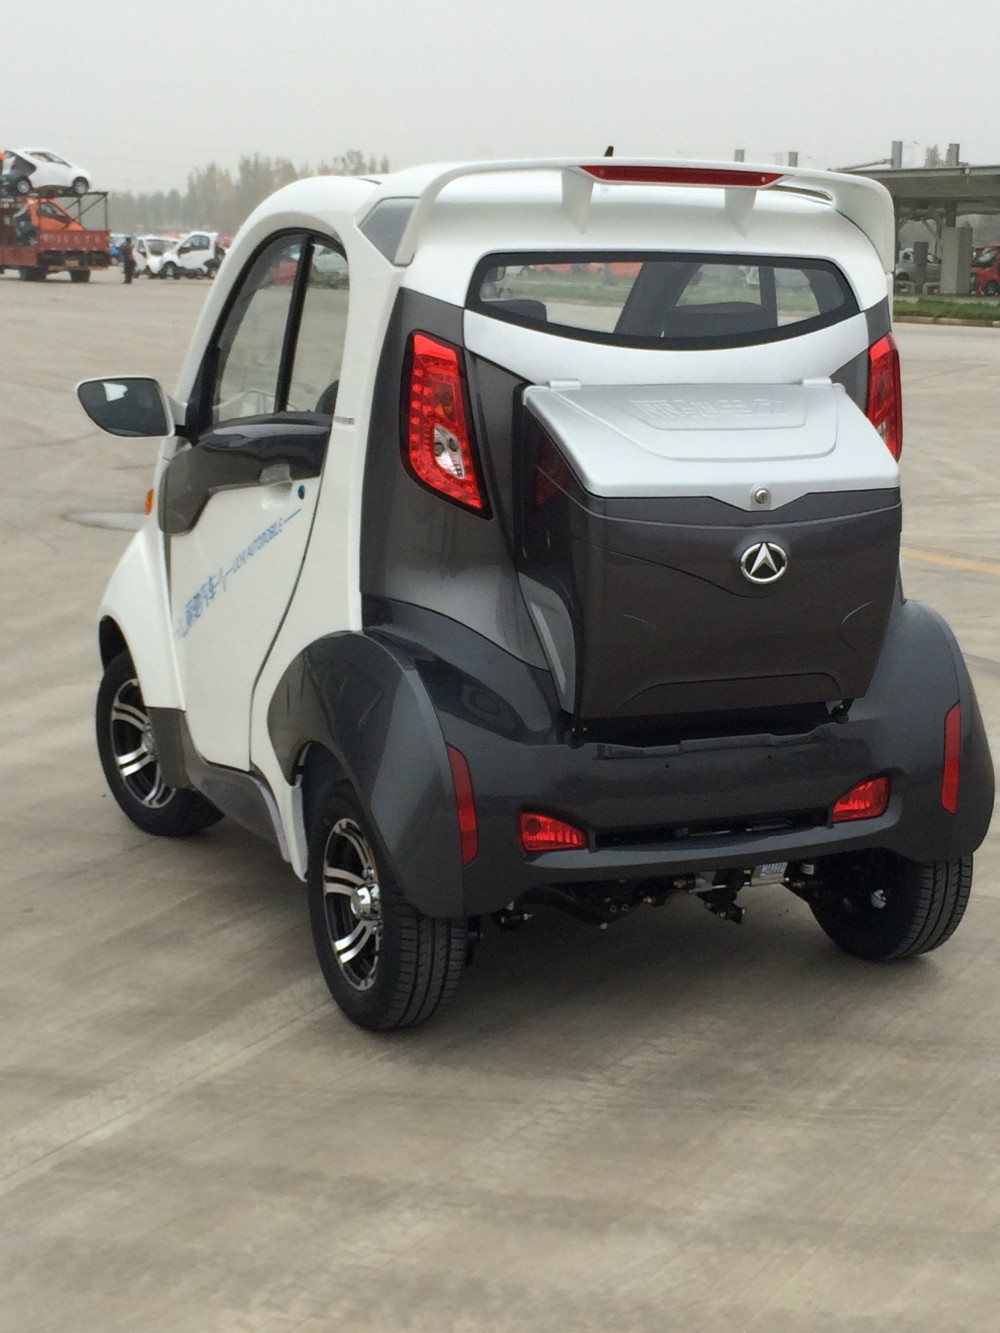 A01 Mini Elektrische Auto Eeg Goedgekeurd Met 2 Zetels Kleine